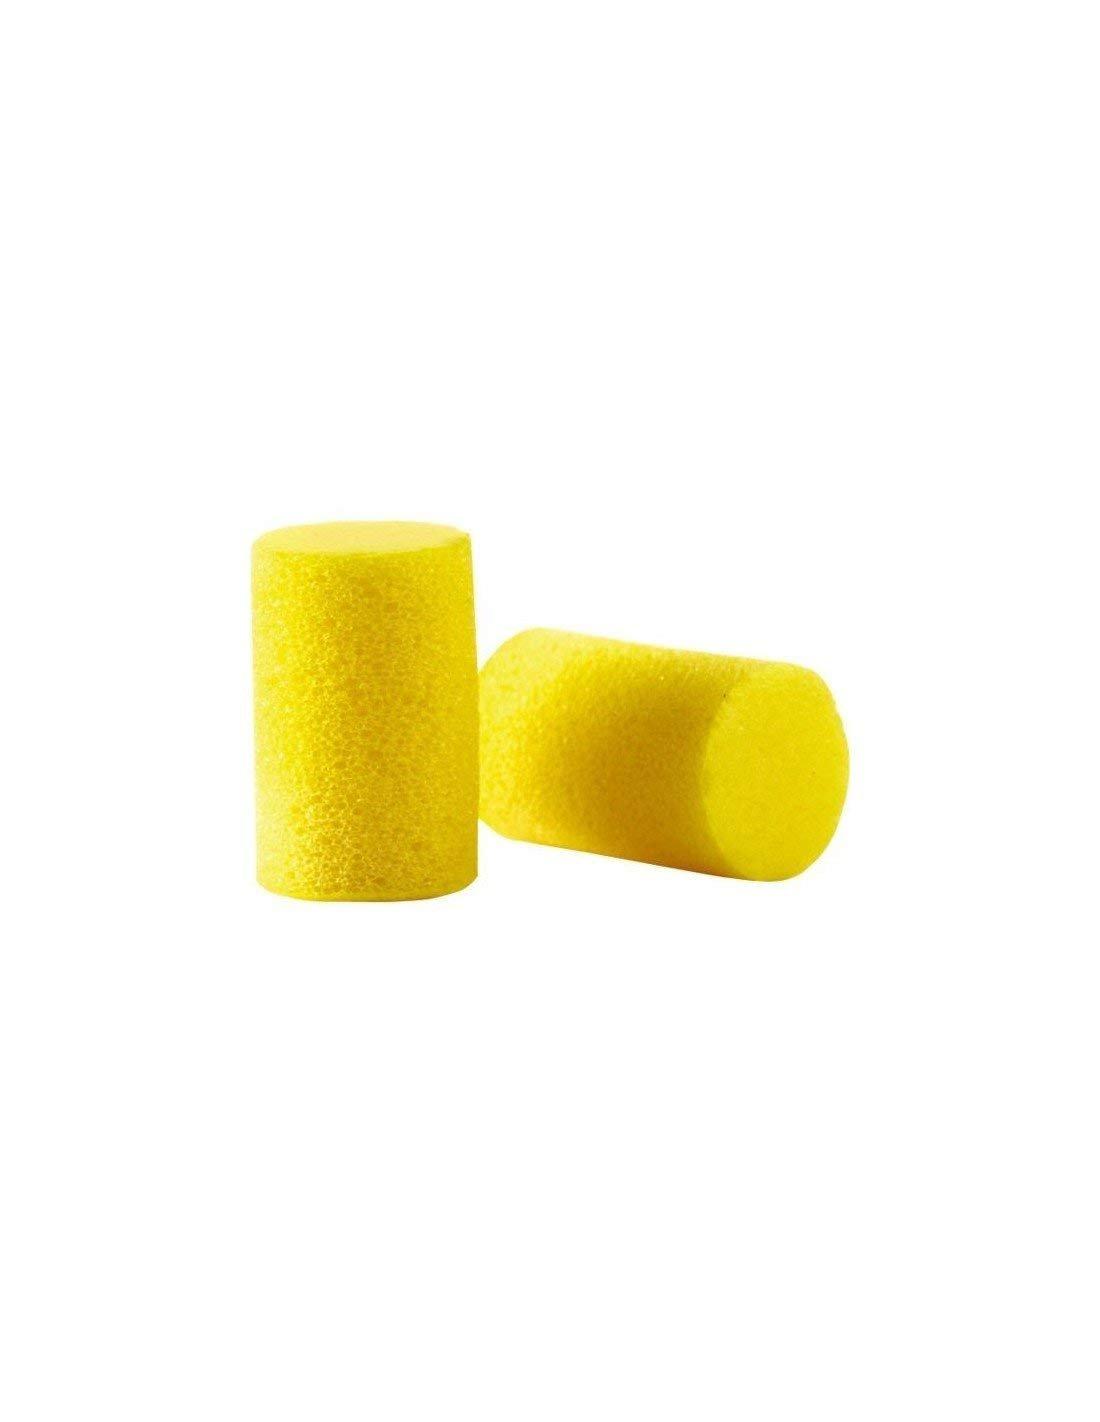 20 pairs 3M E-A-R Classic Earplugs PP-01-002 /20